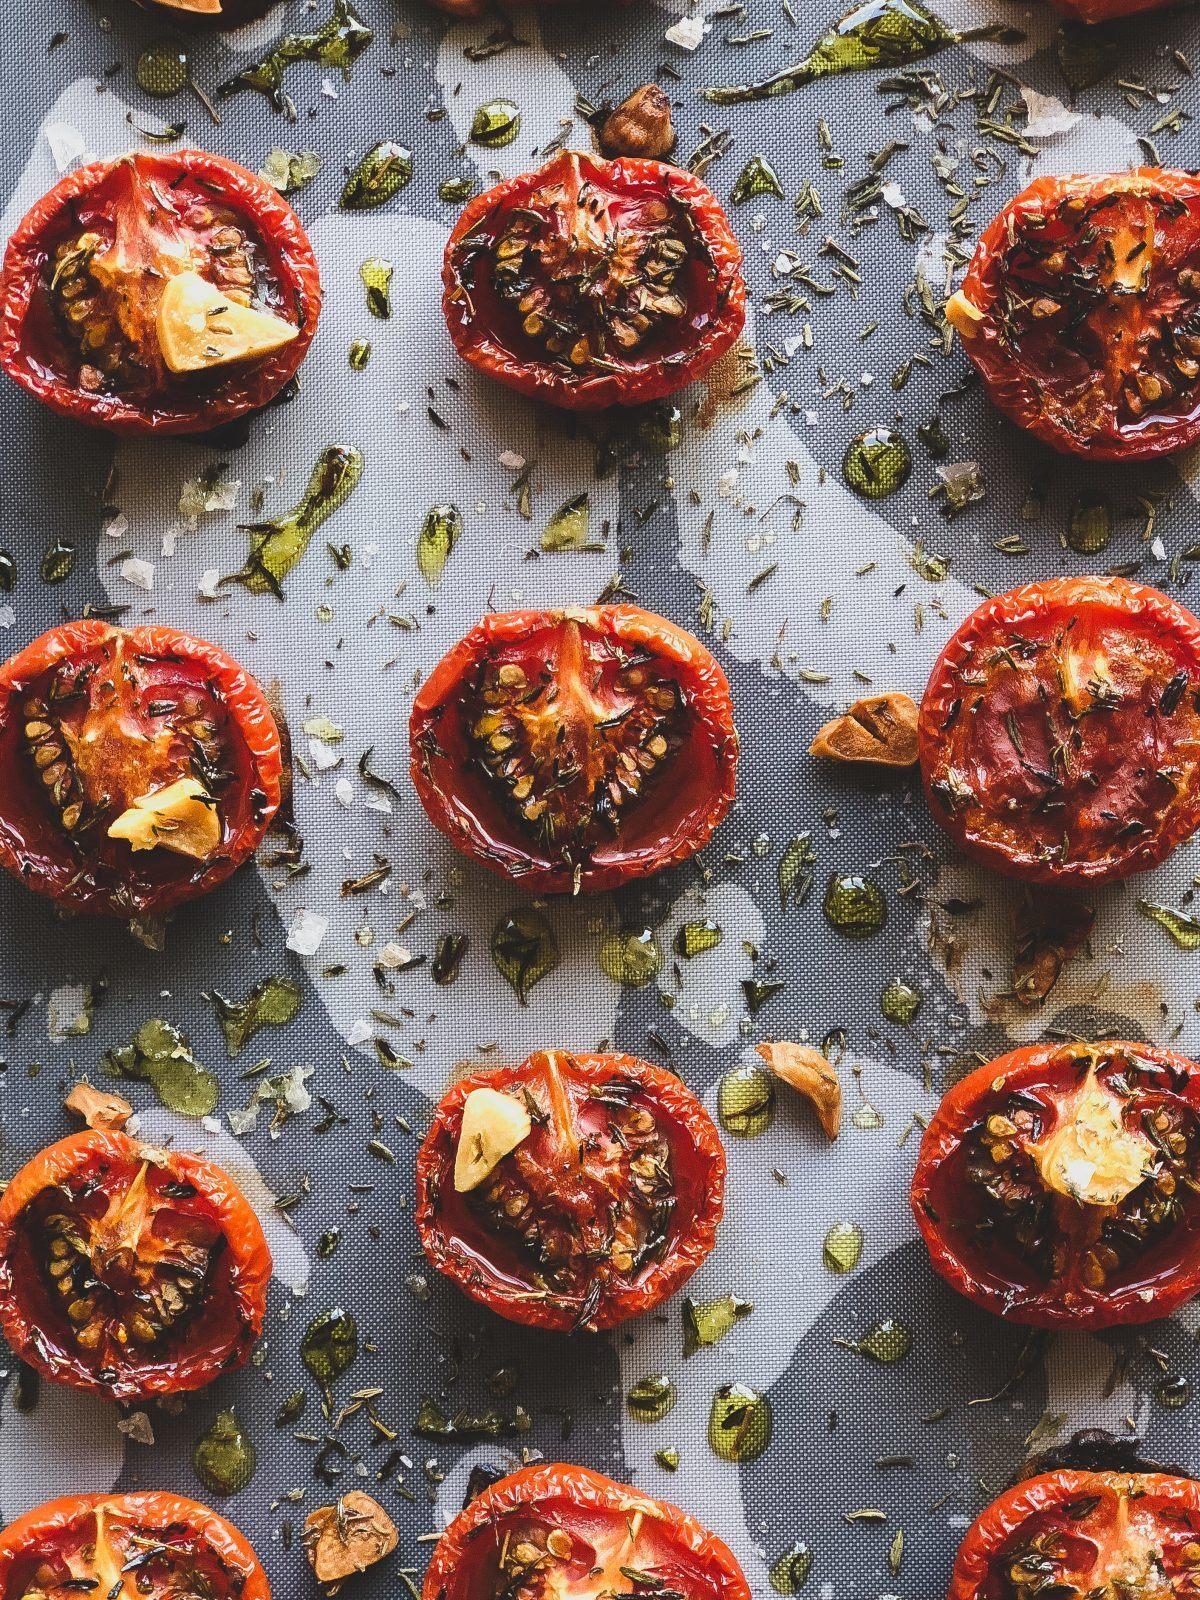 langtidsbagte-tomater-soede-semidried-tomater